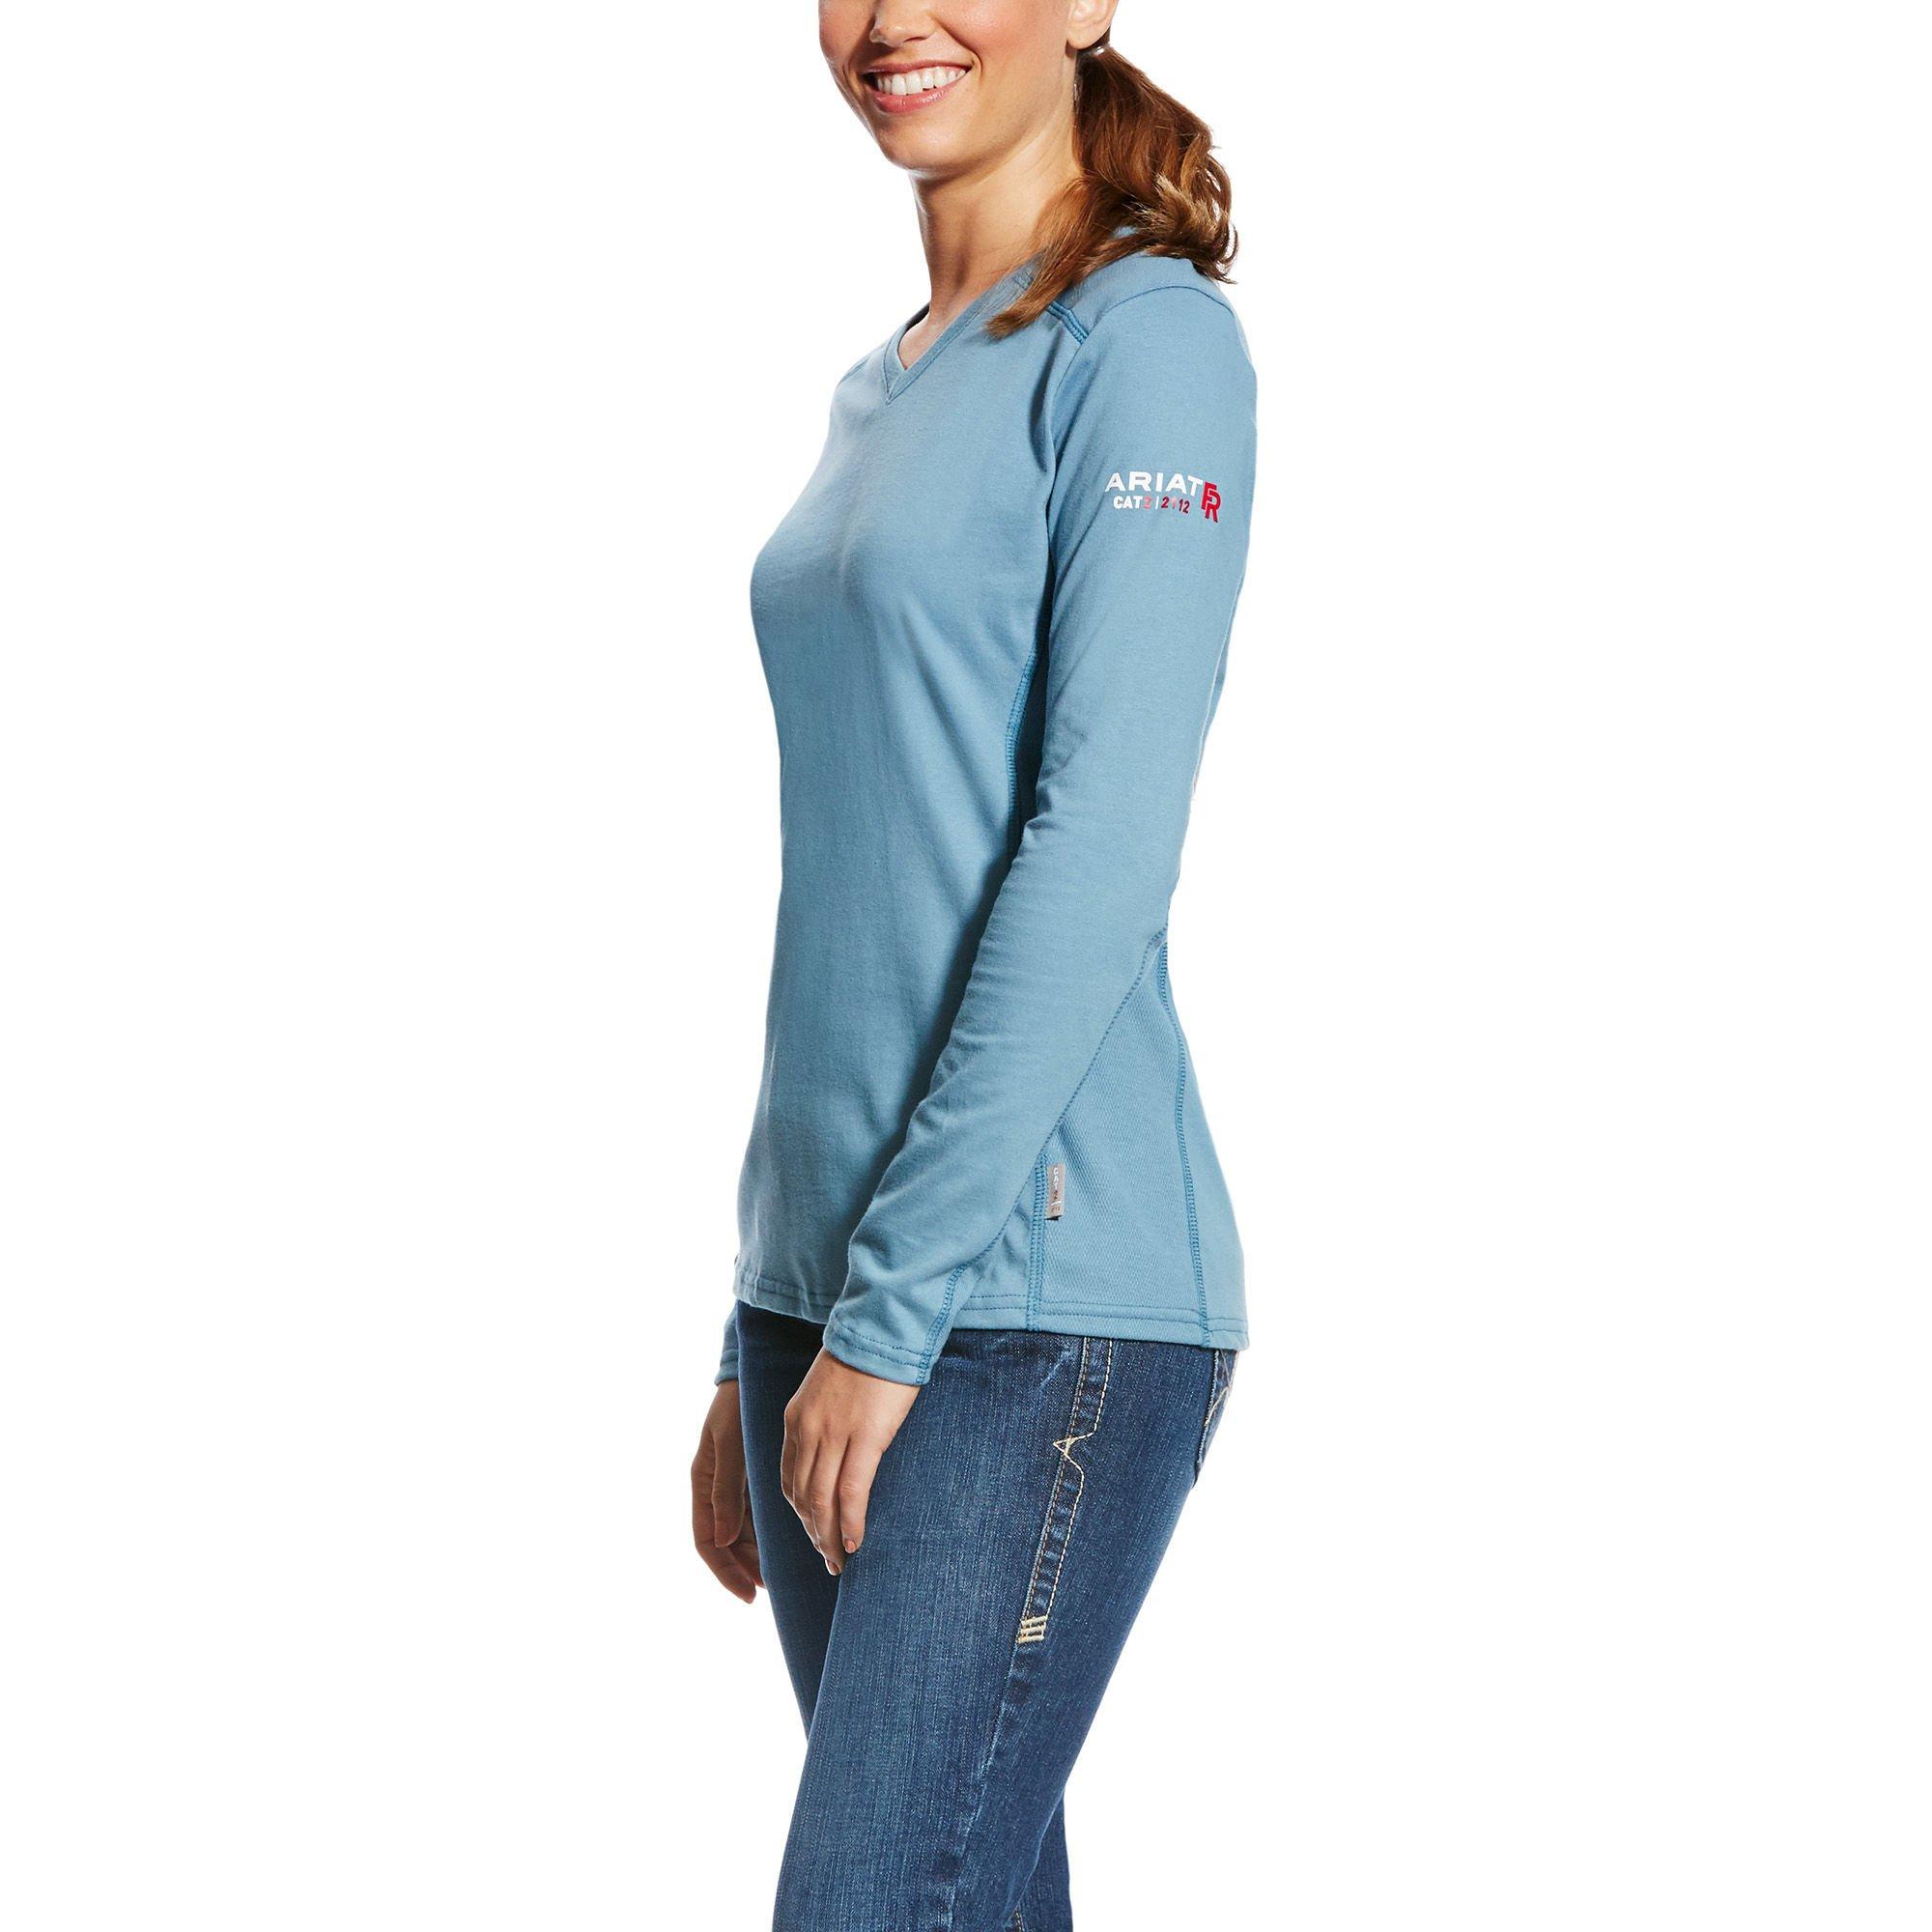 Ariat Women's Flame Resistant Ac Top, Blue, XL